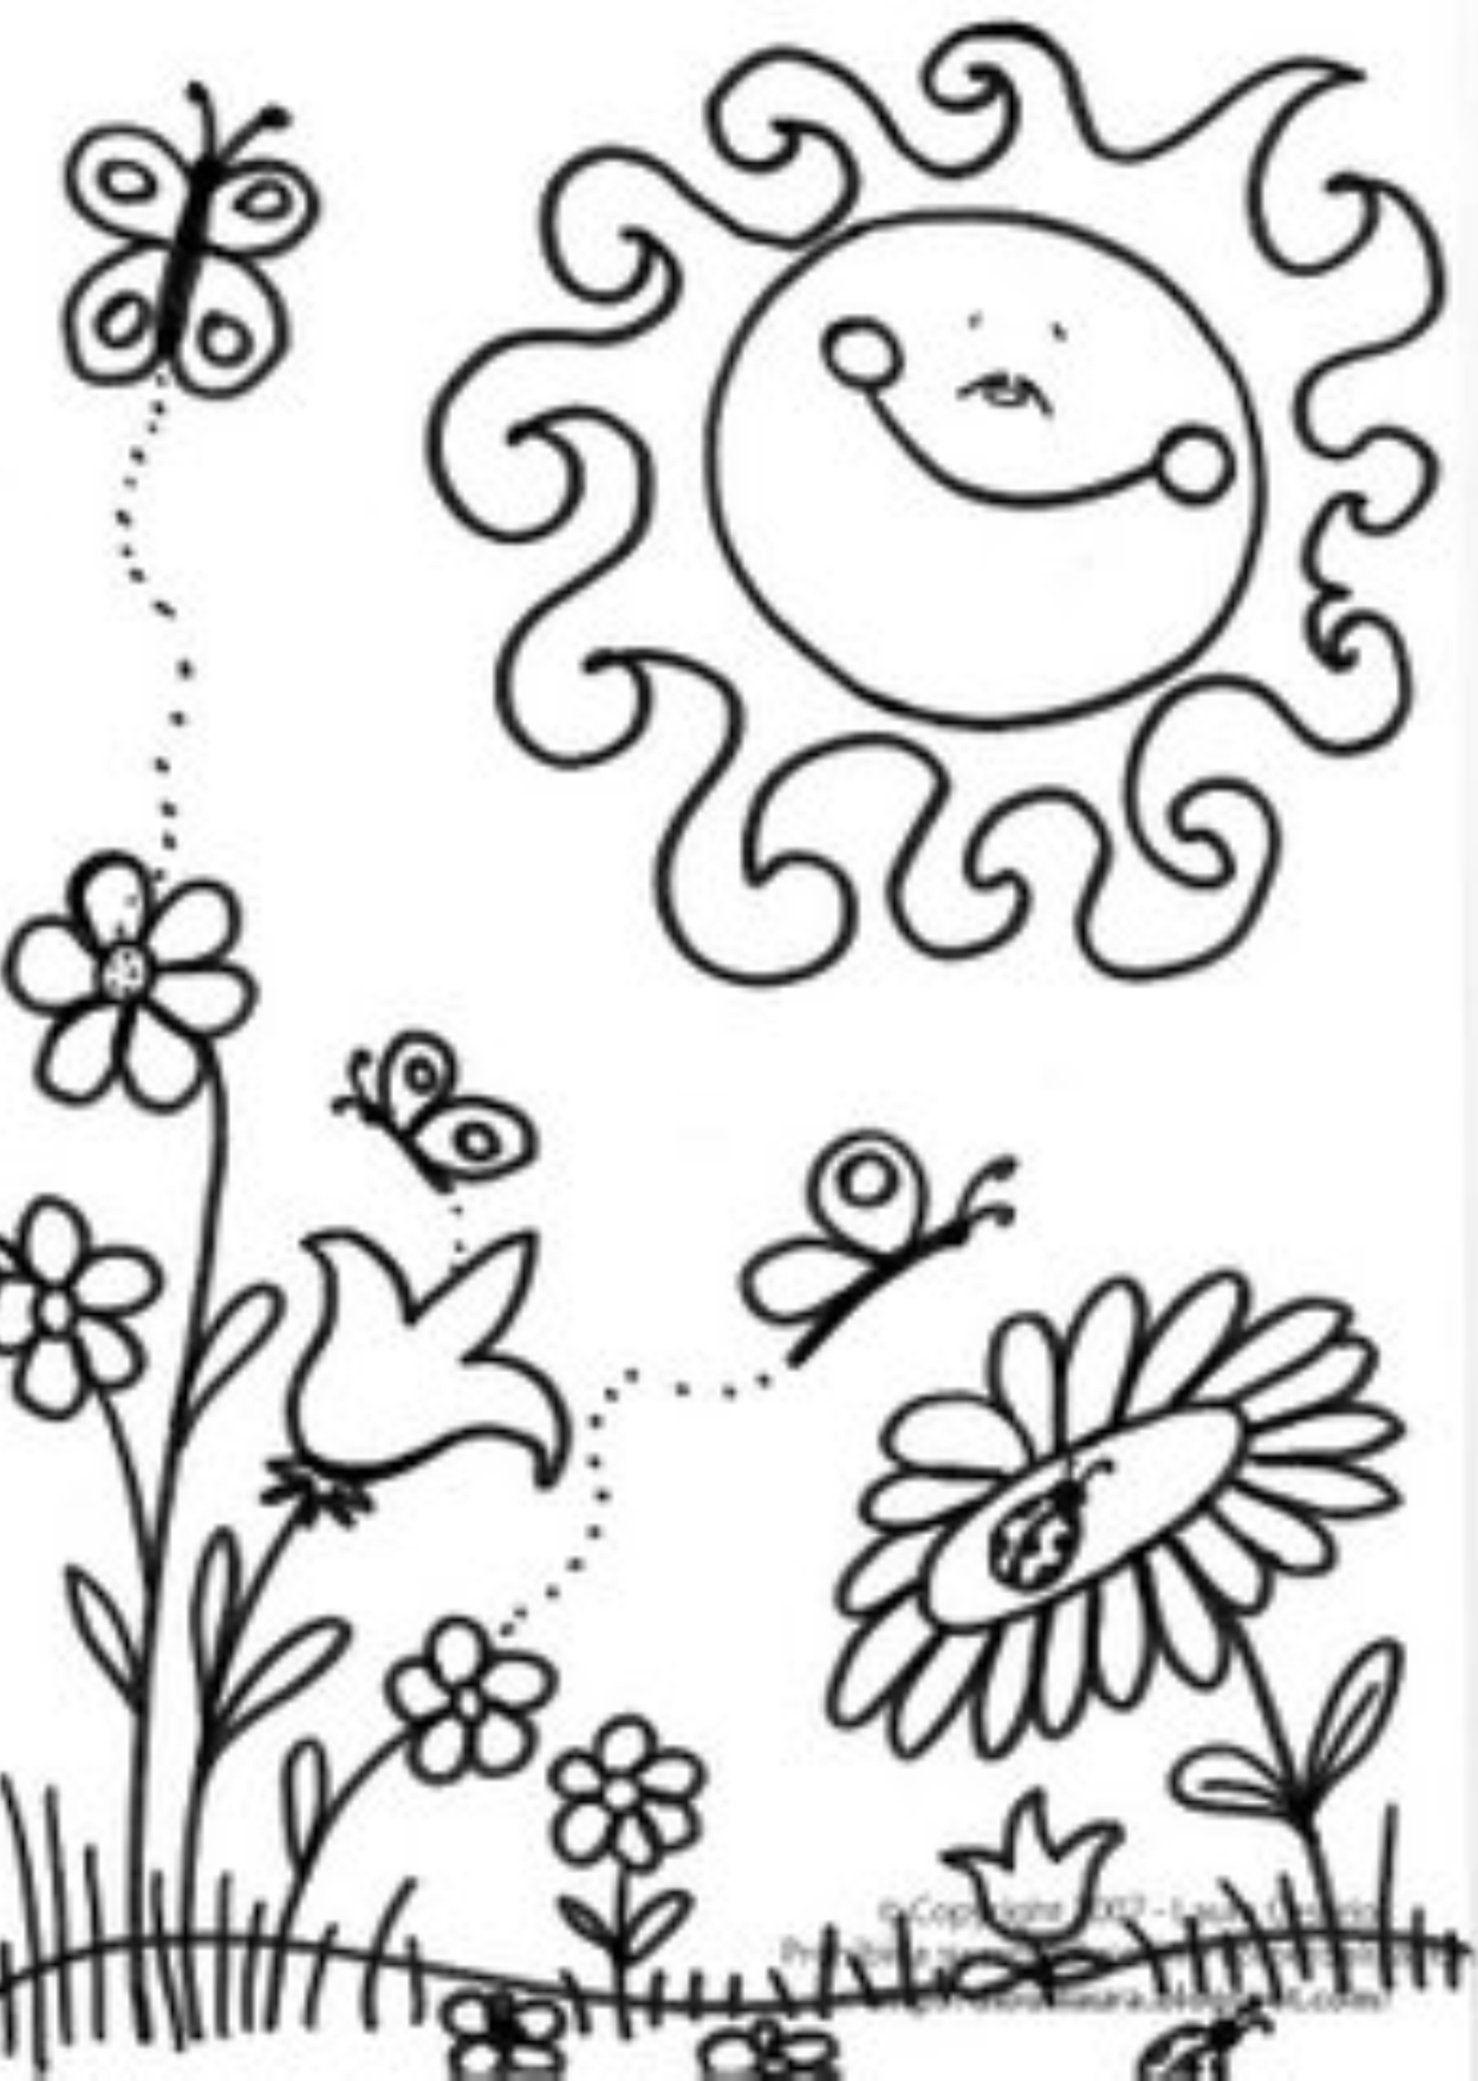 spring break coloring pages spring break coloring pages at getcoloringscom free spring break pages coloring